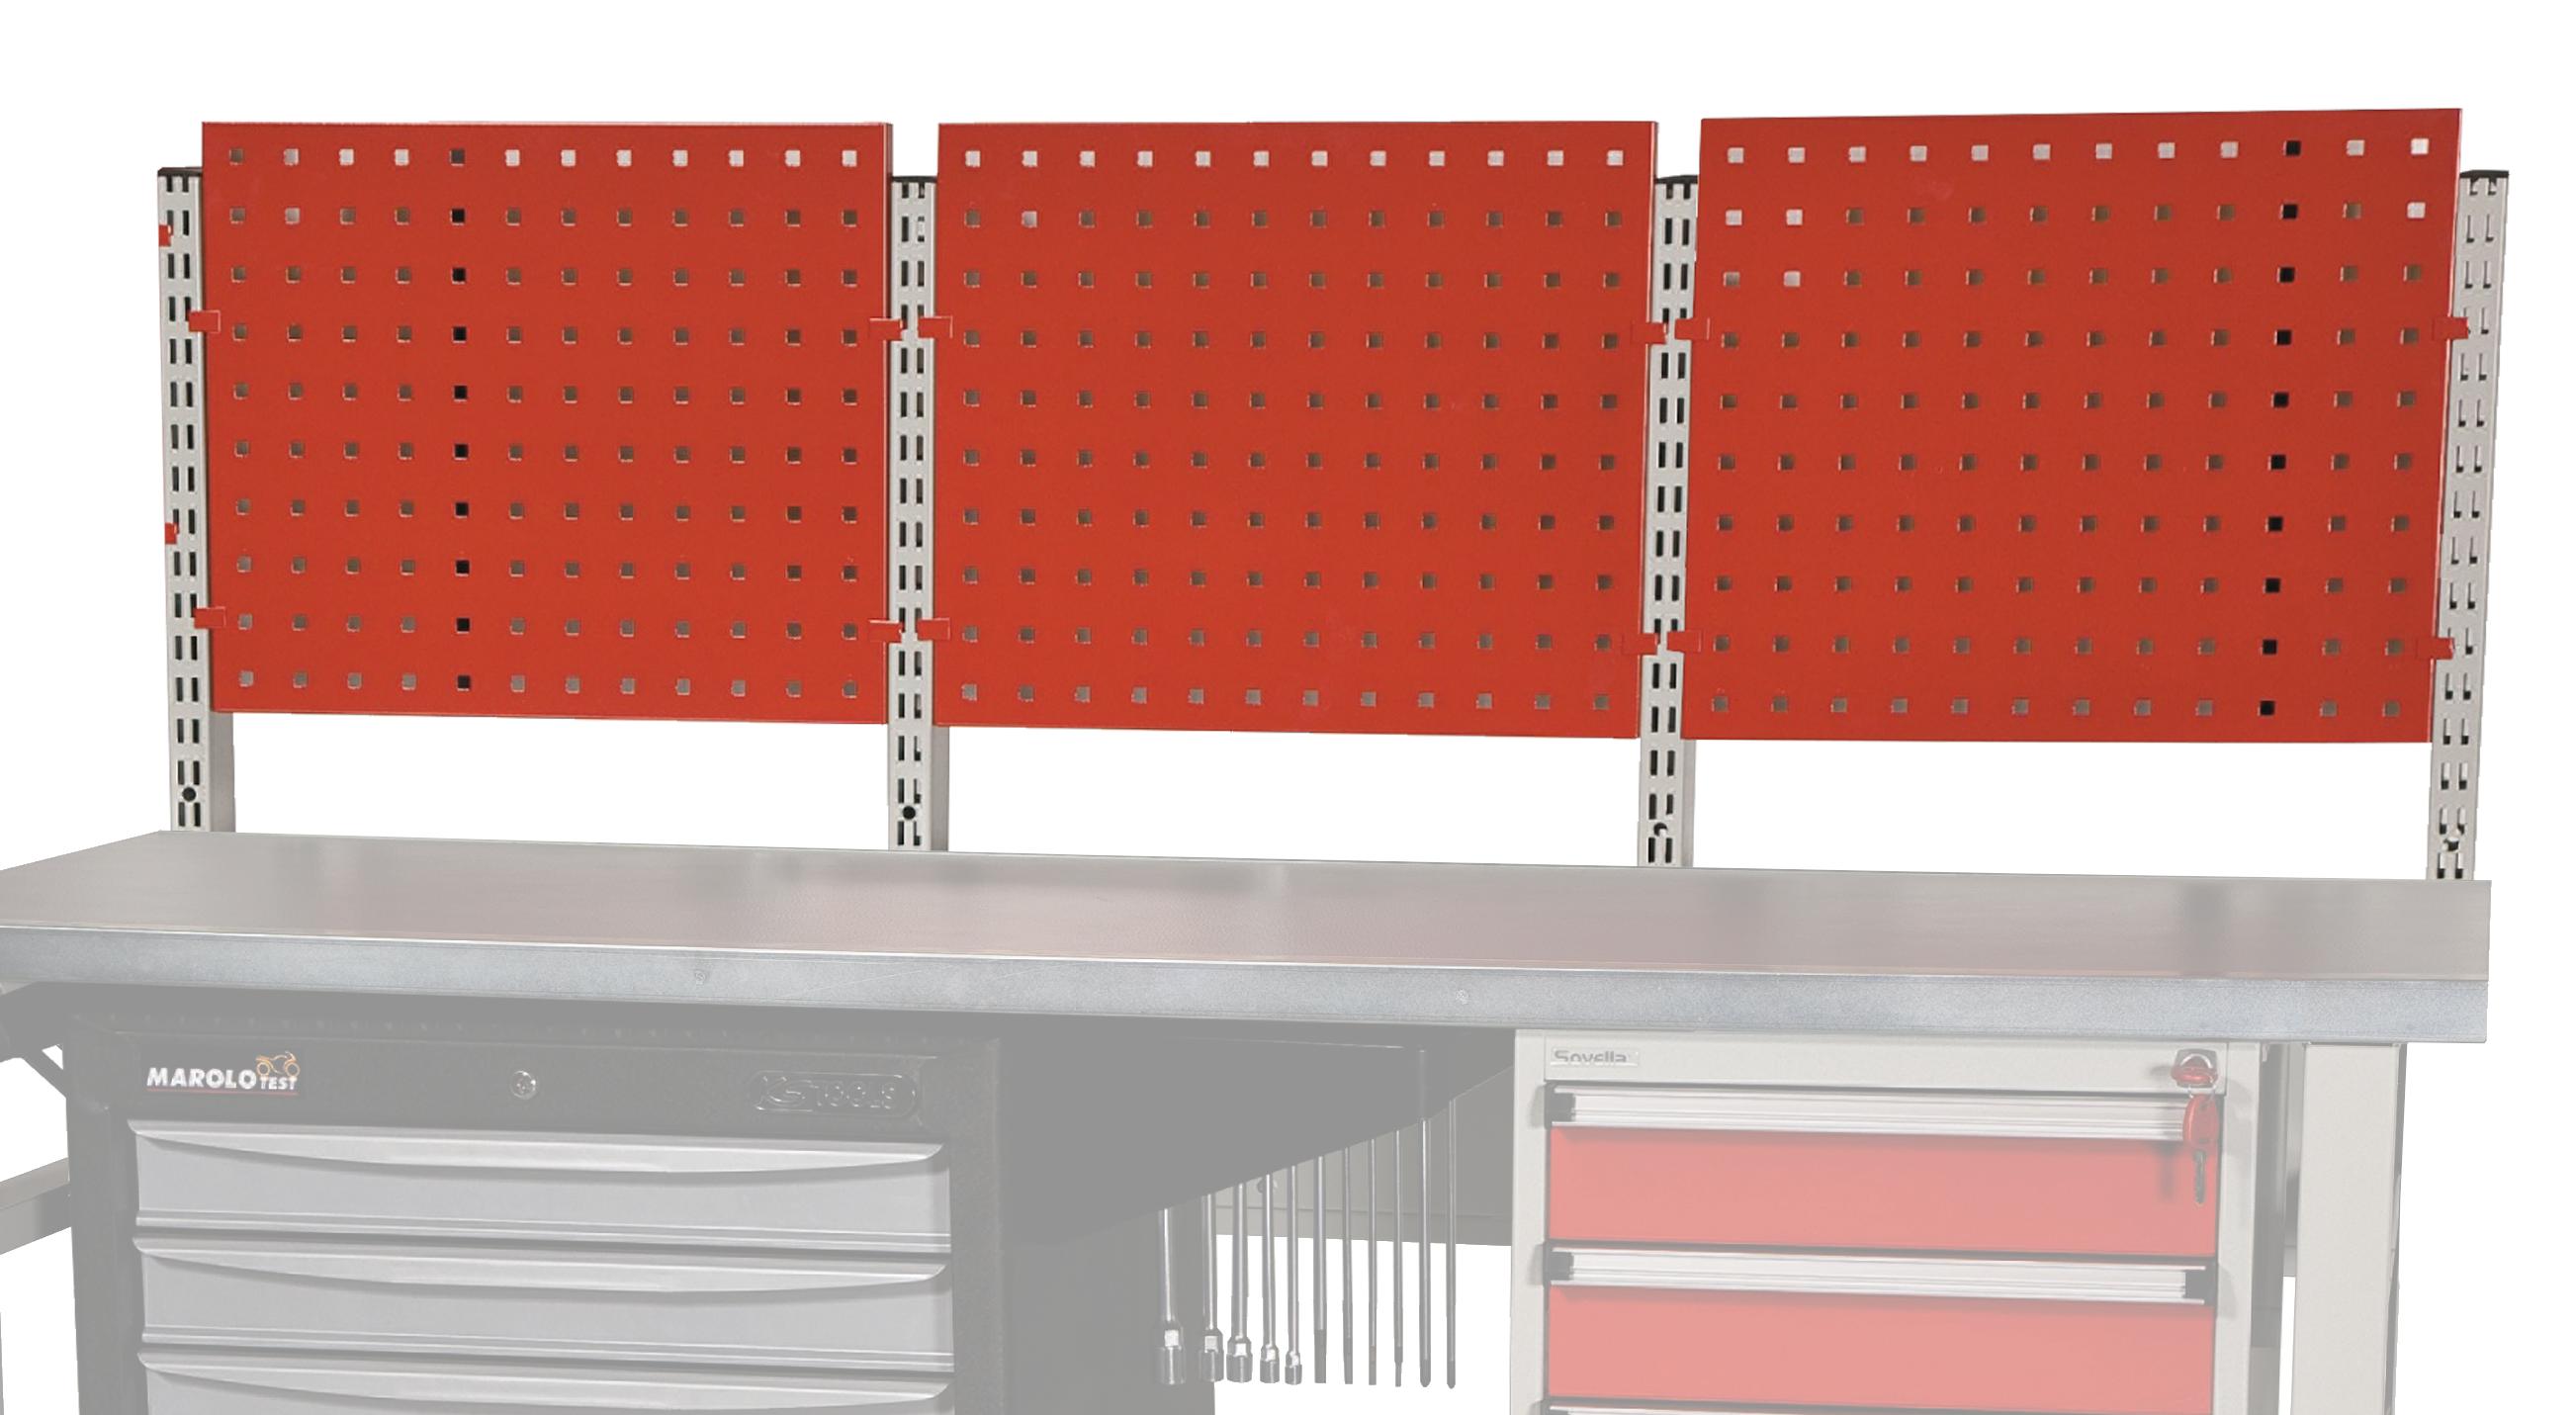 marolotest panneau perfor 1 5 m. Black Bedroom Furniture Sets. Home Design Ideas